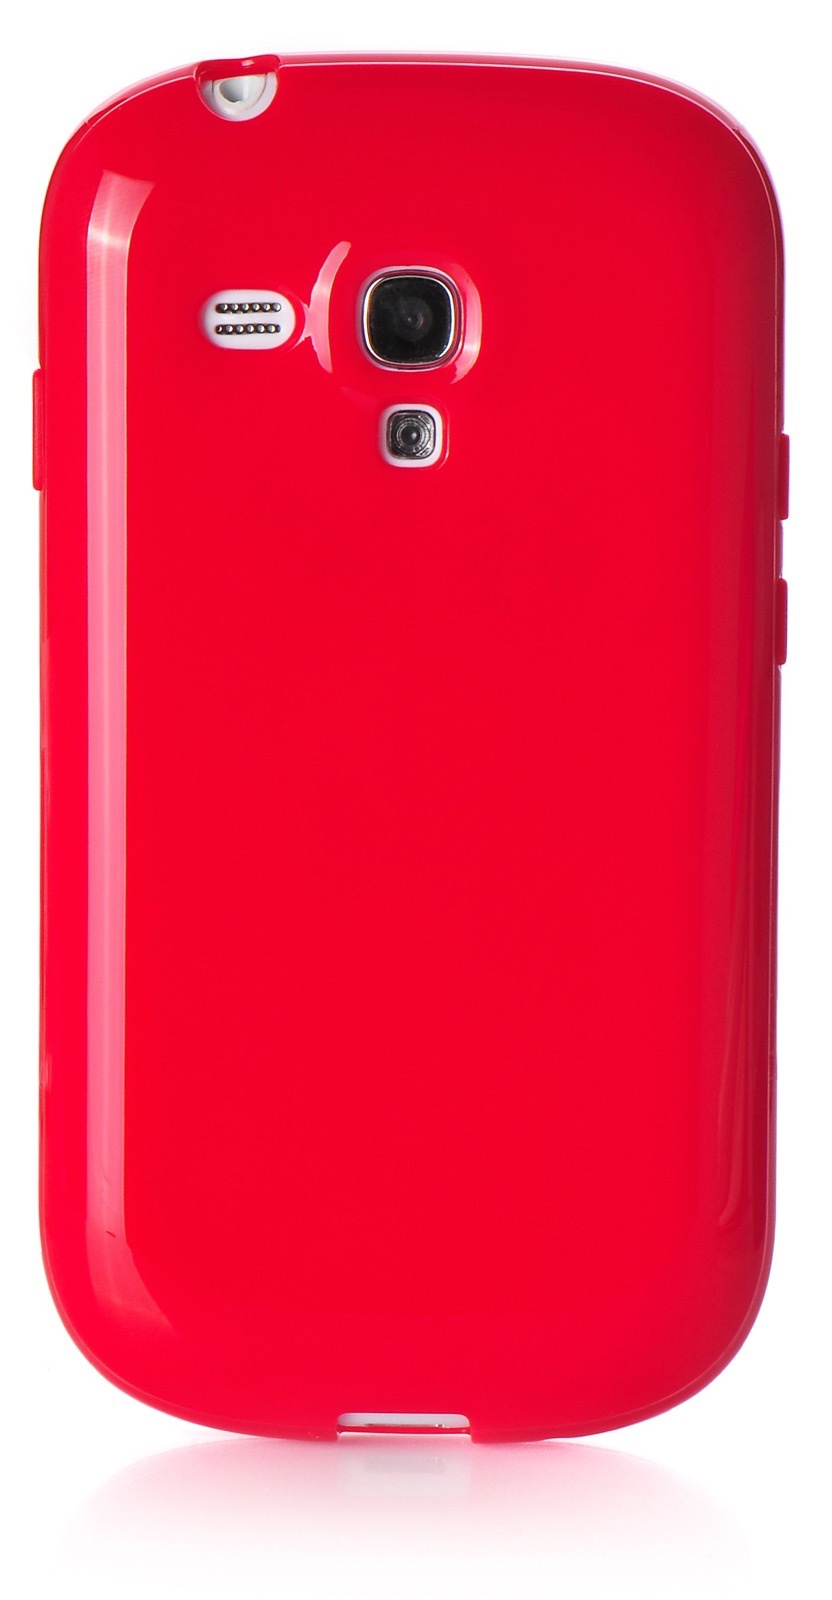 Чехол iNeez накладка силикон мыльница red для Samsung Galaxy S3 mini,420027, красный